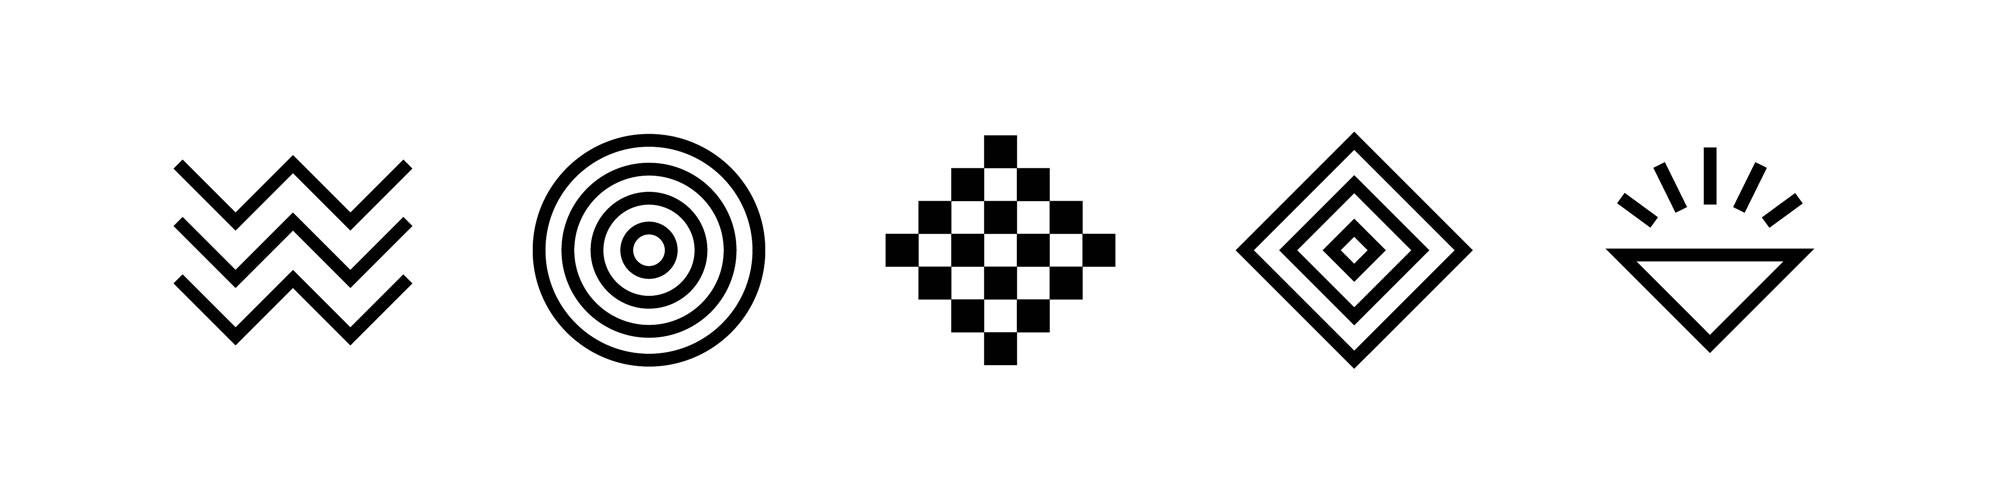 sion10000-symbols